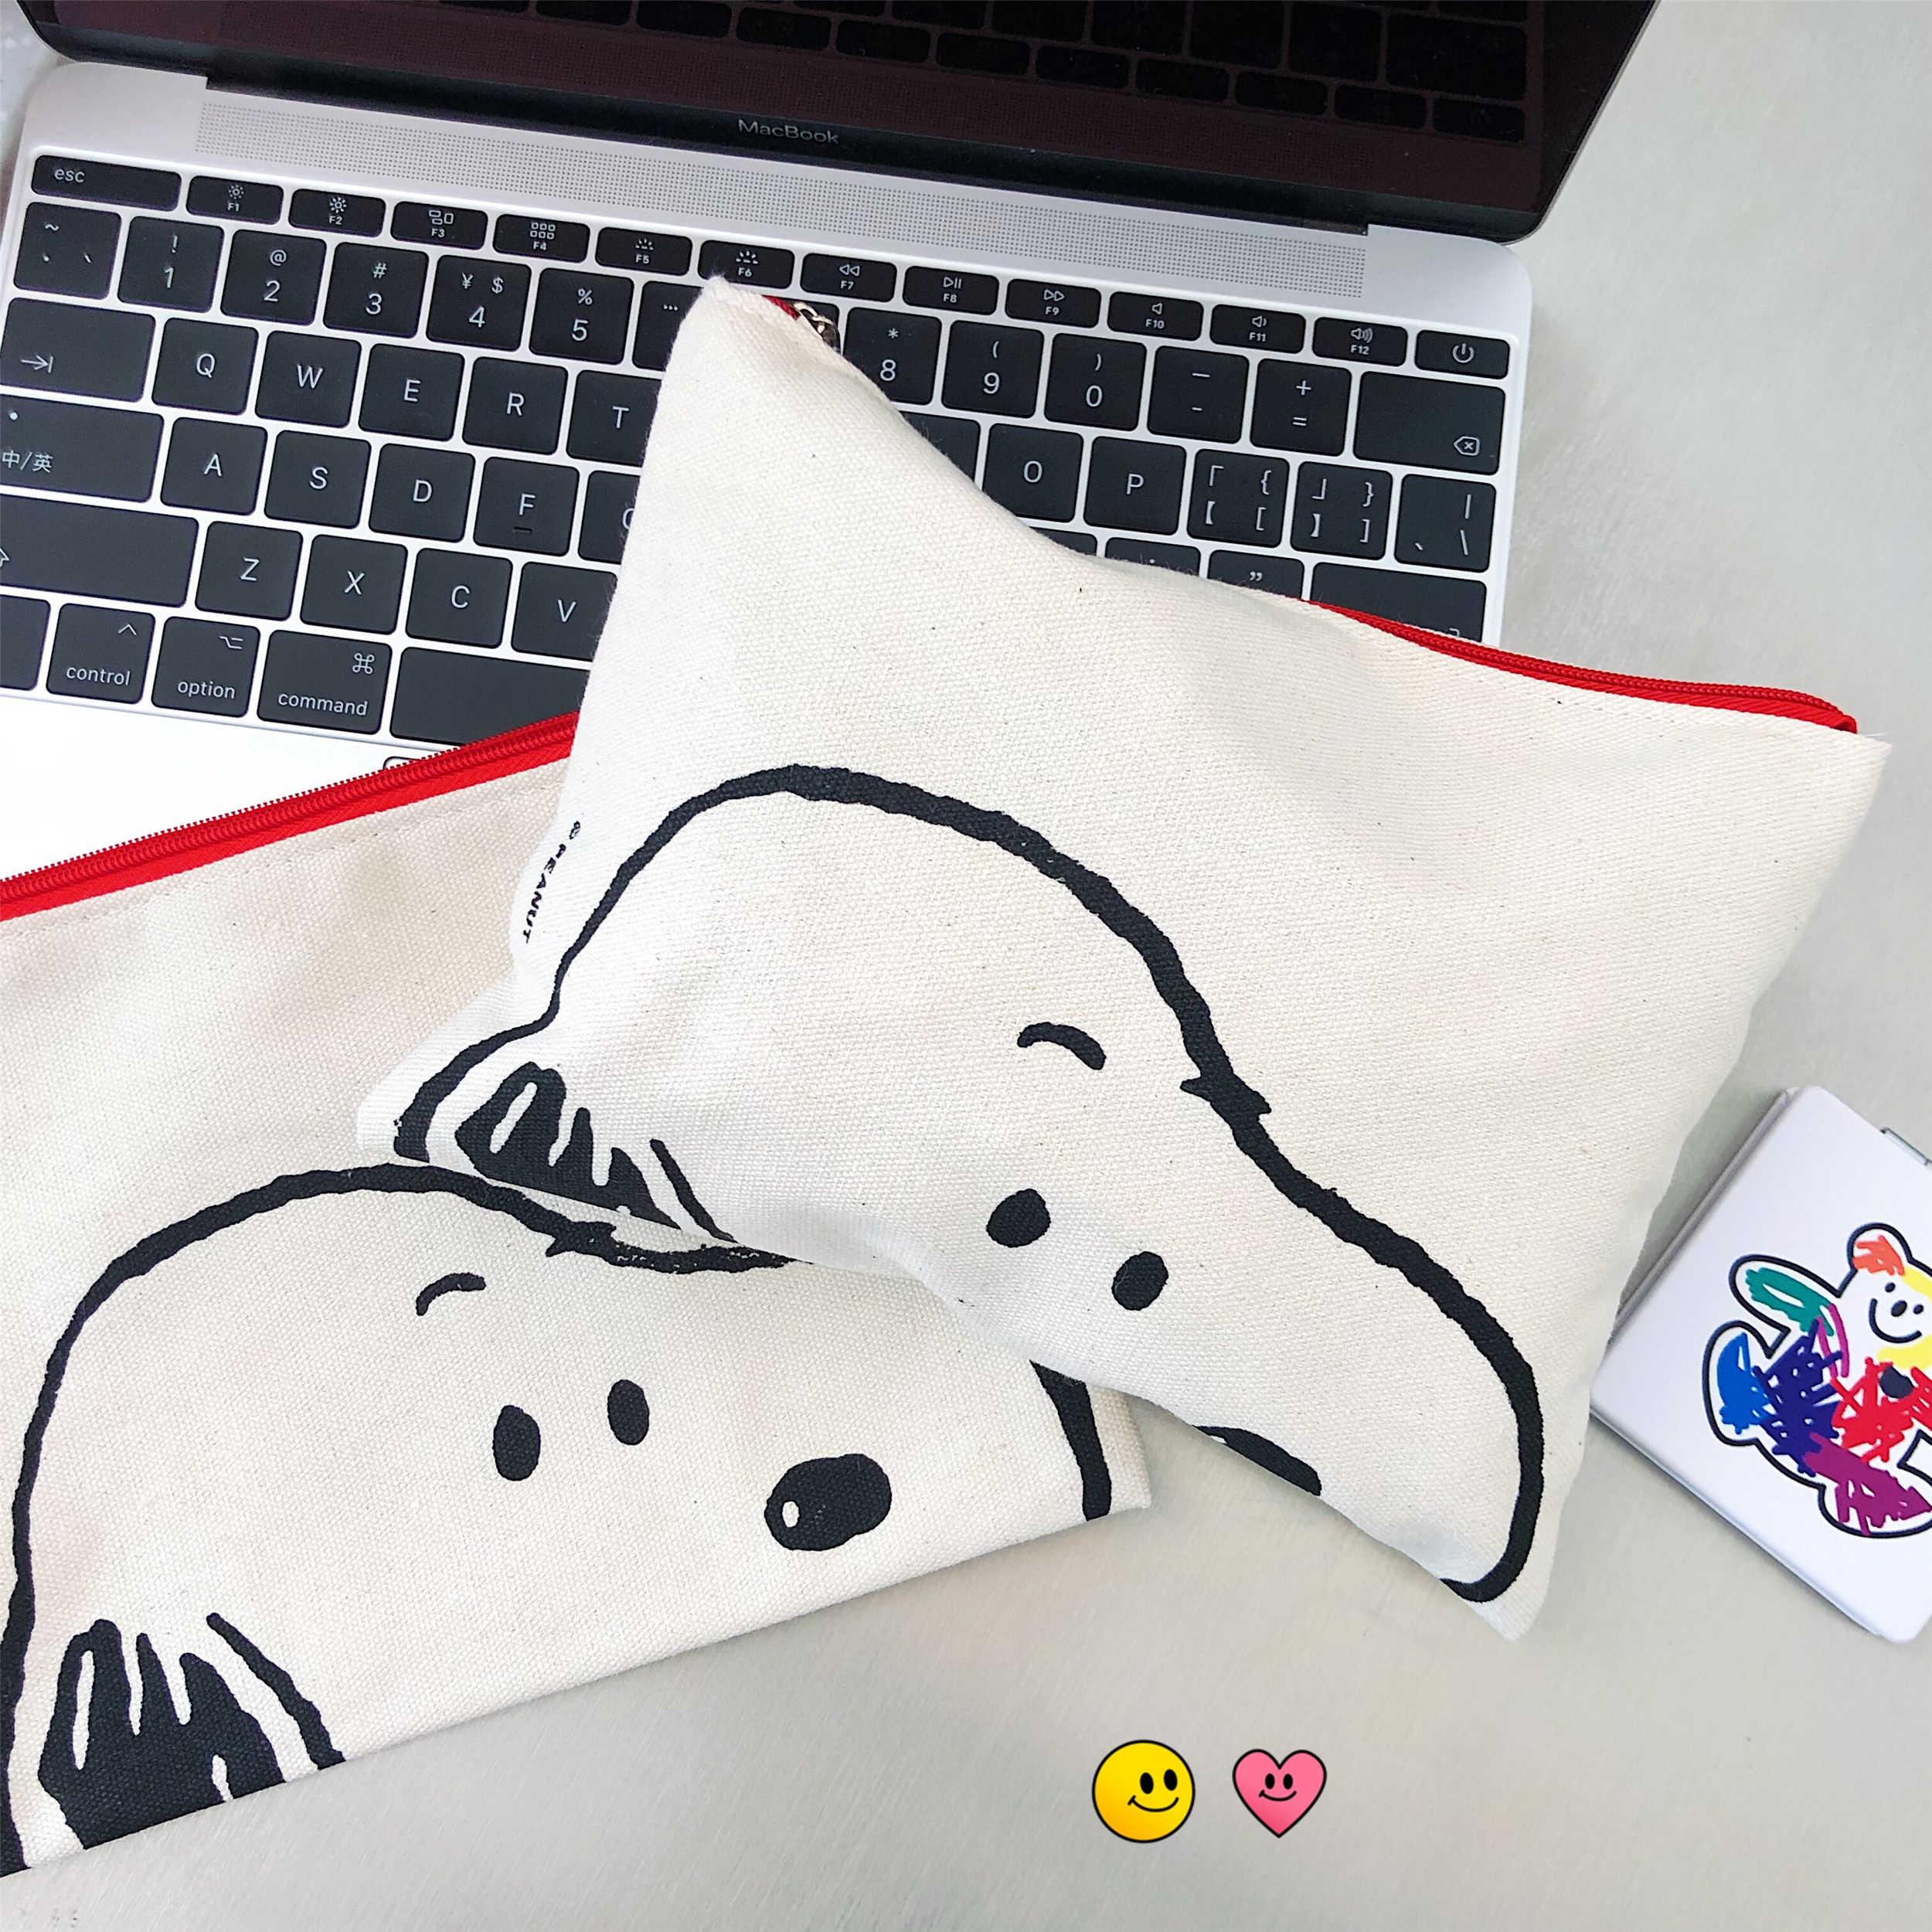 Rogue Dog Pen Bag Cosmetic Bag Cartoon Printed Canvas Handbag Cute Pig Student Pen Bag Personality Storage Bag School Supplies